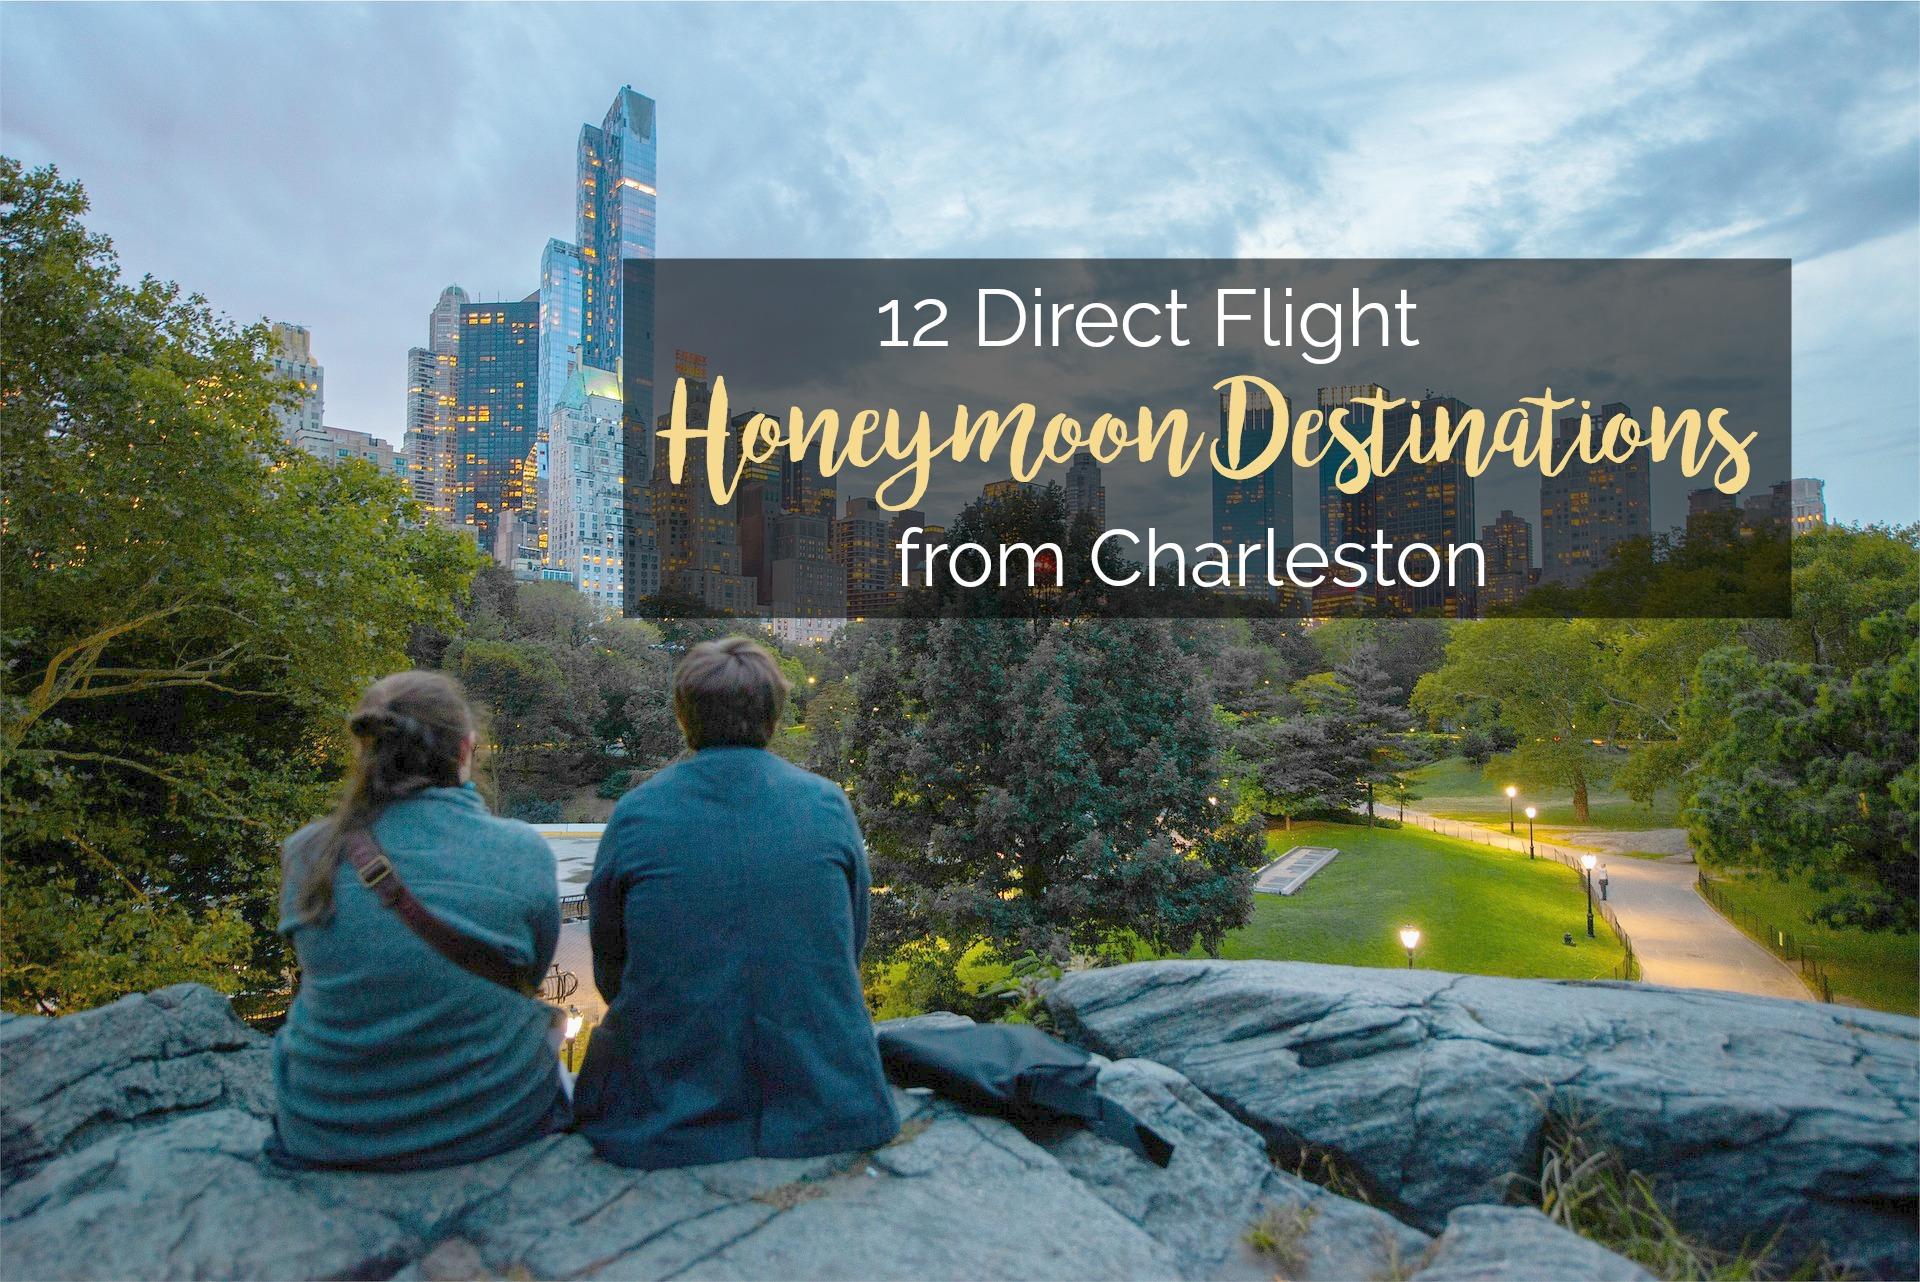 12 Direct Flight Honeymoon Destinations from Charleston, South Carolina